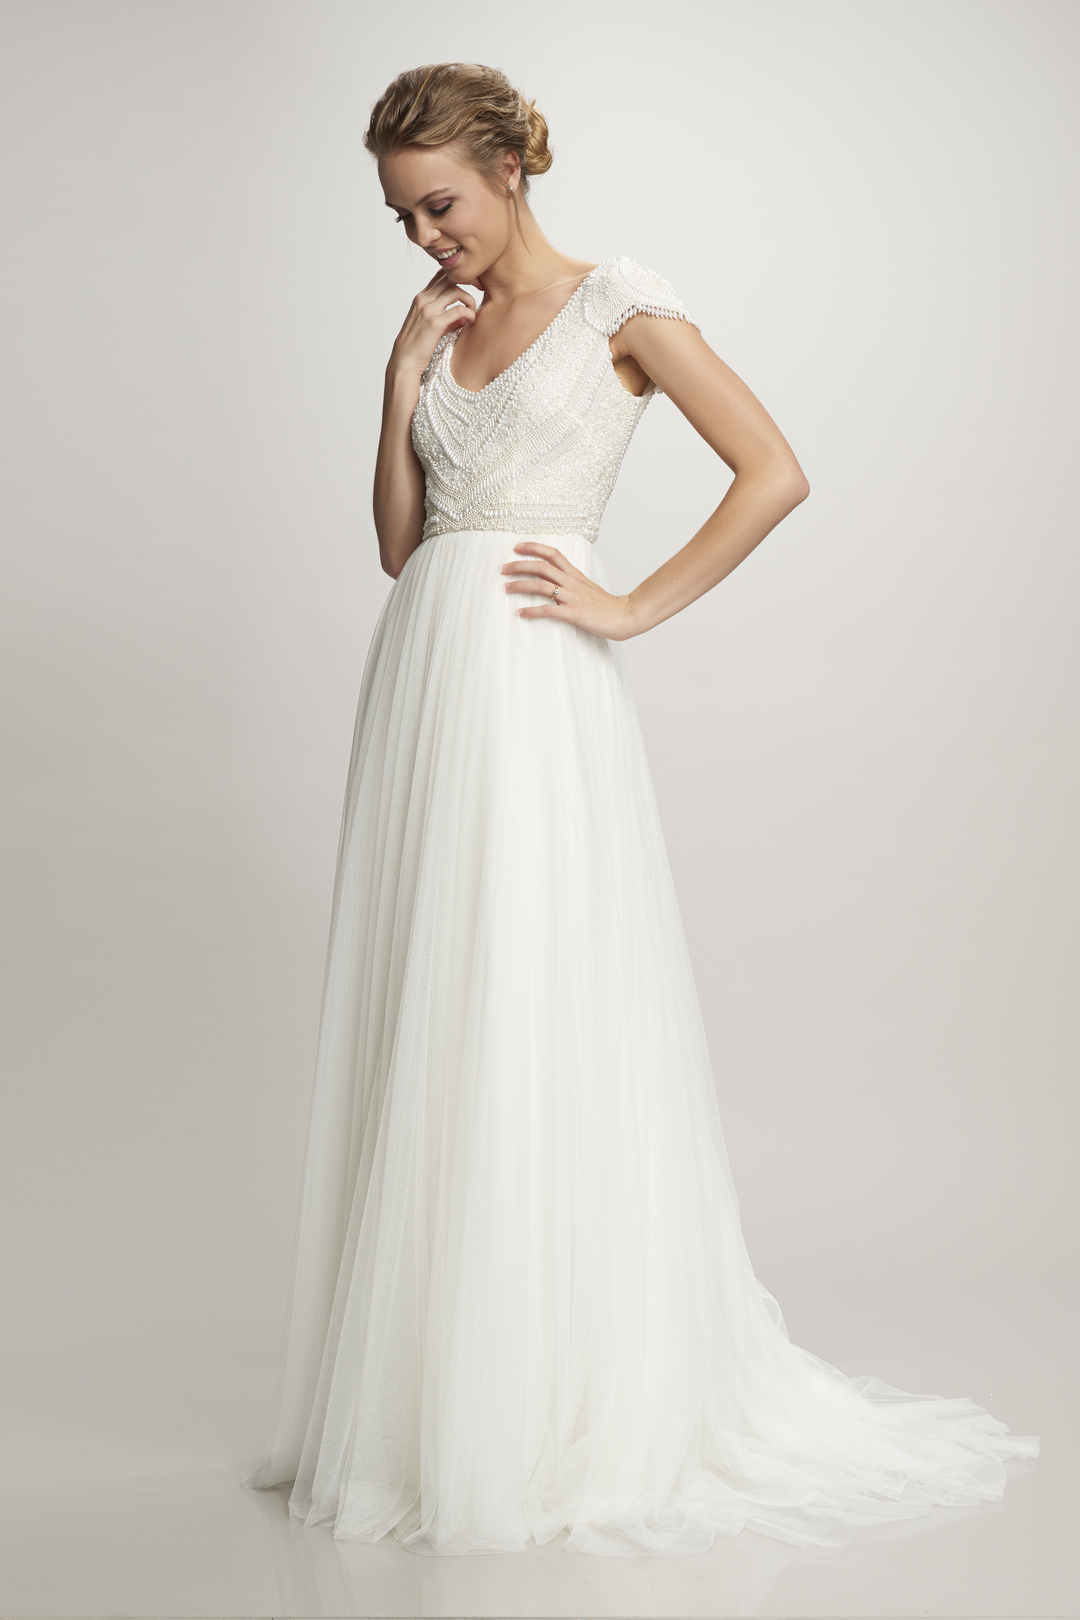 Dress main 2x 1547044505